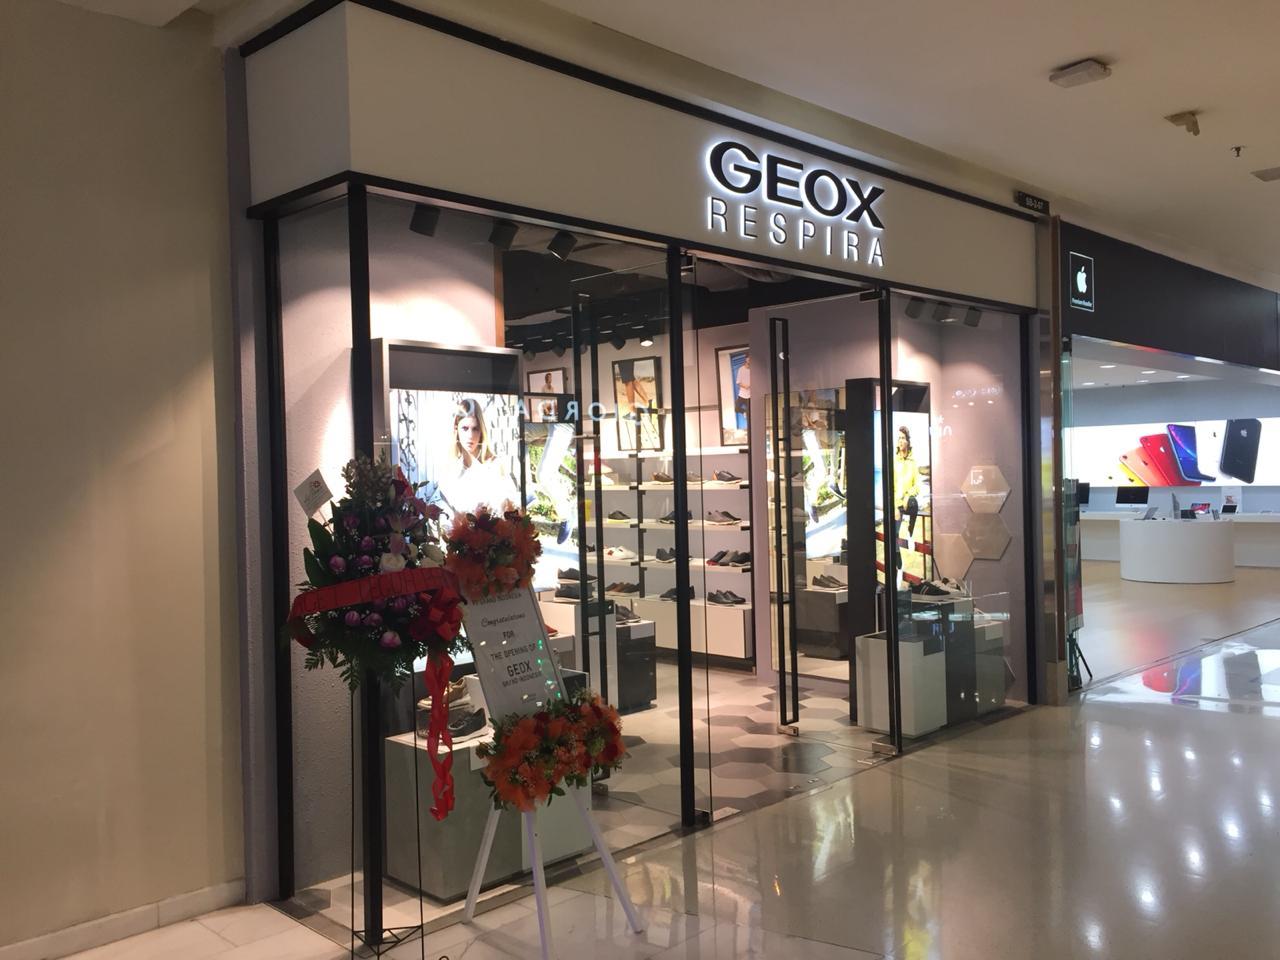 Asco Restaurar Disgusto  Geox - Grand Indonesia